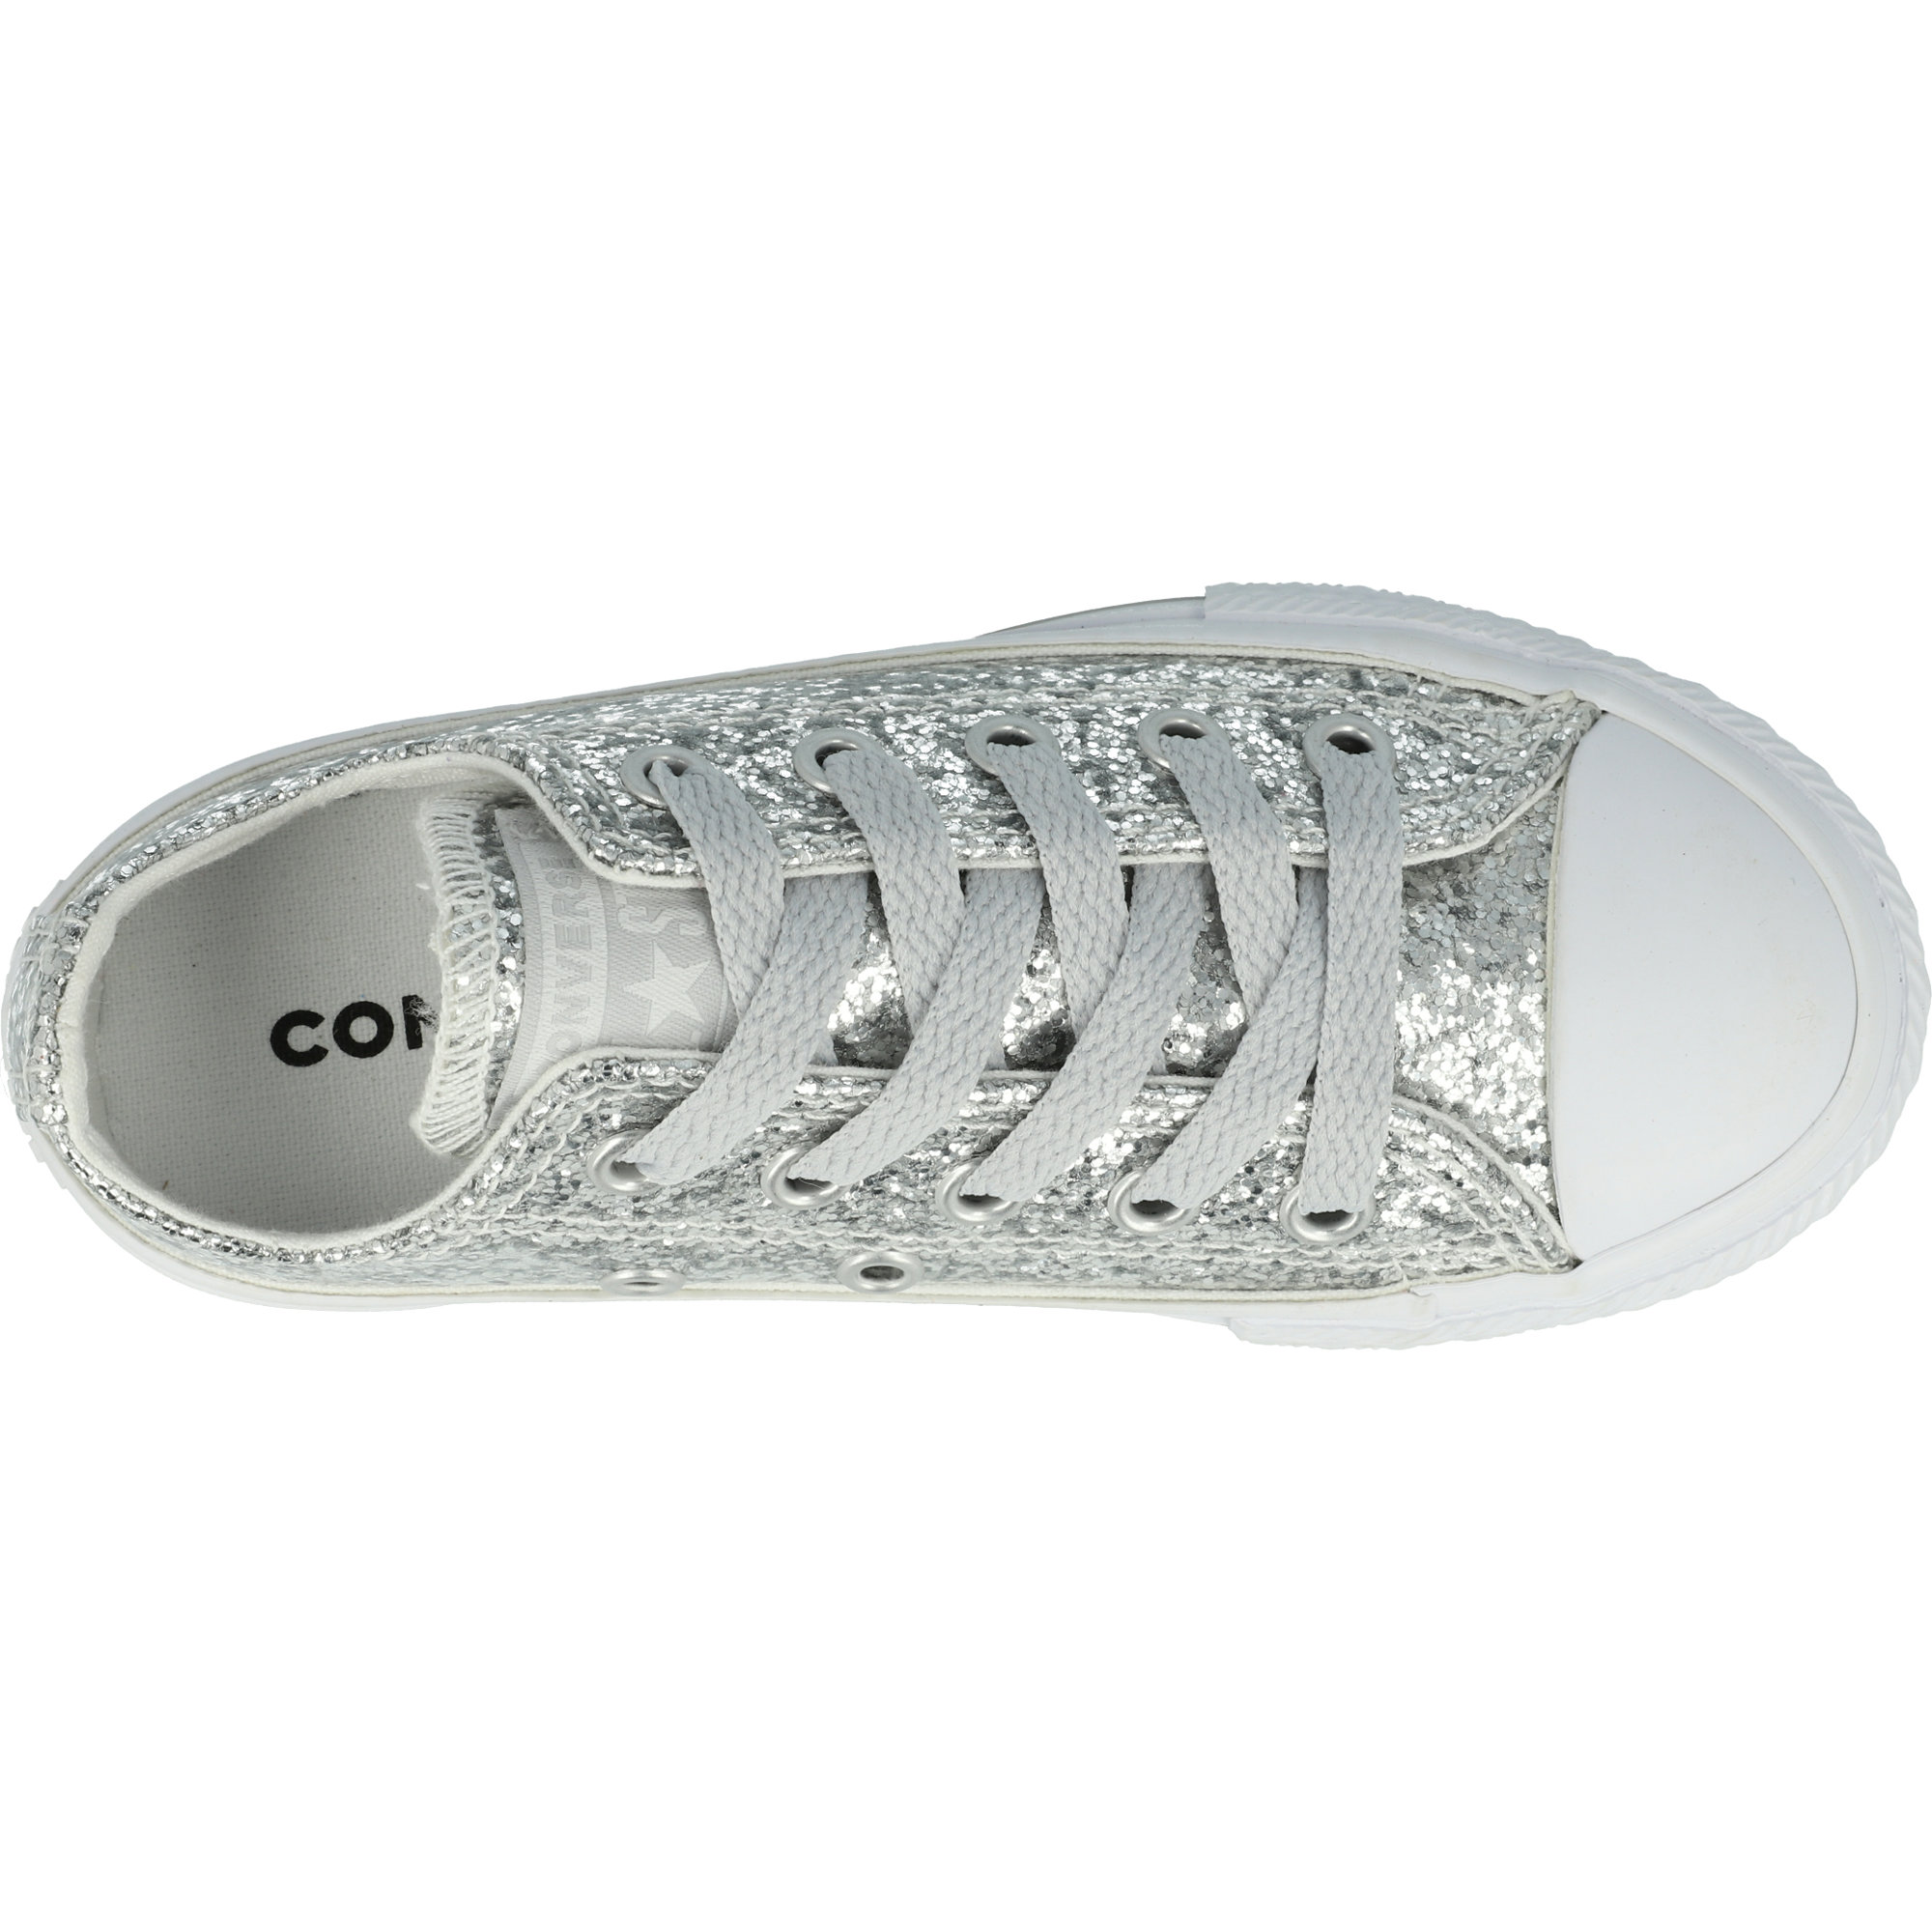 Converse Chuck Taylor All Star Glitter Pure Silver Synthetic 27 EU